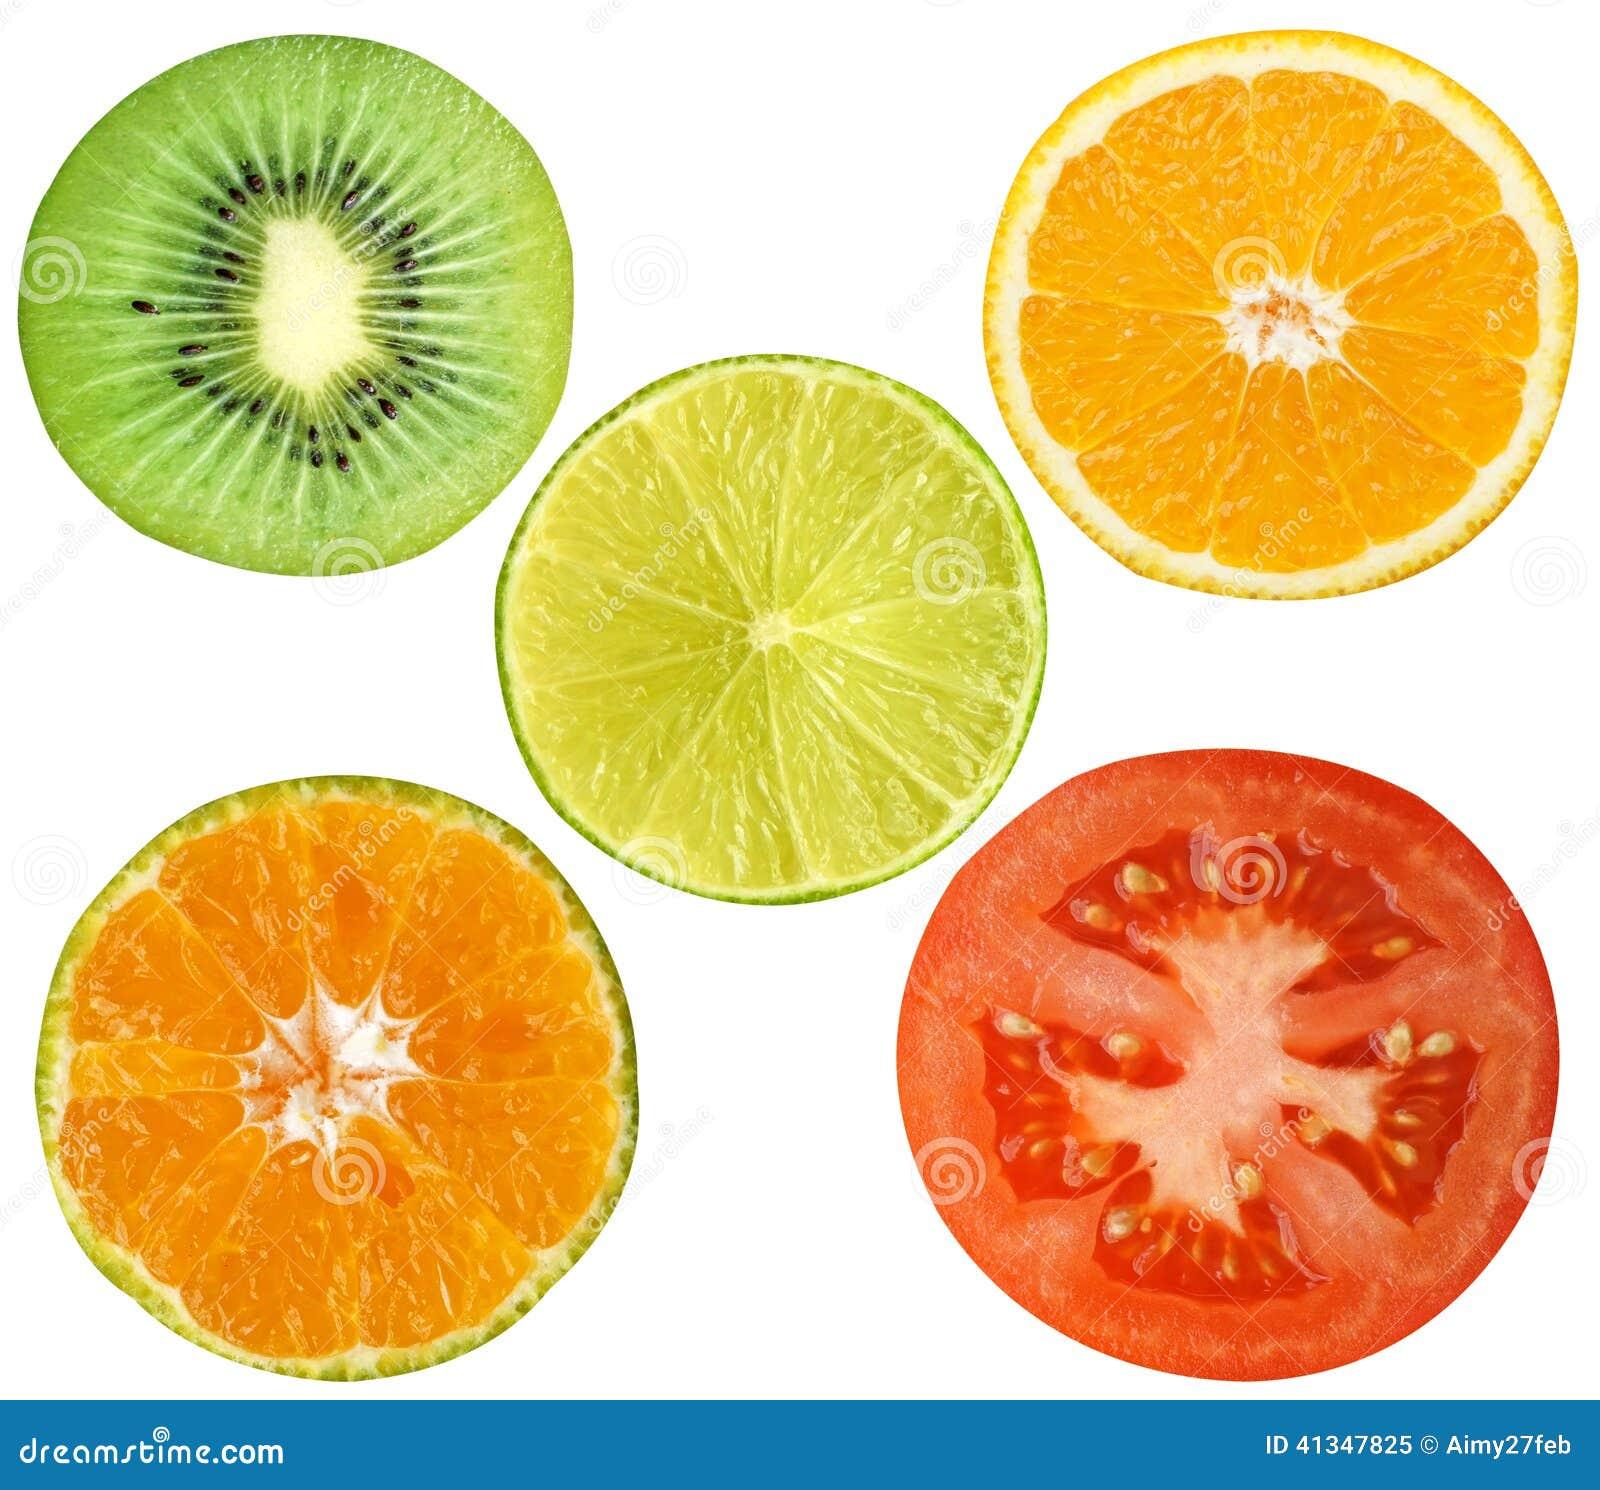 Kiwi citron, apelsin, tomatisolat på vit bakgrund